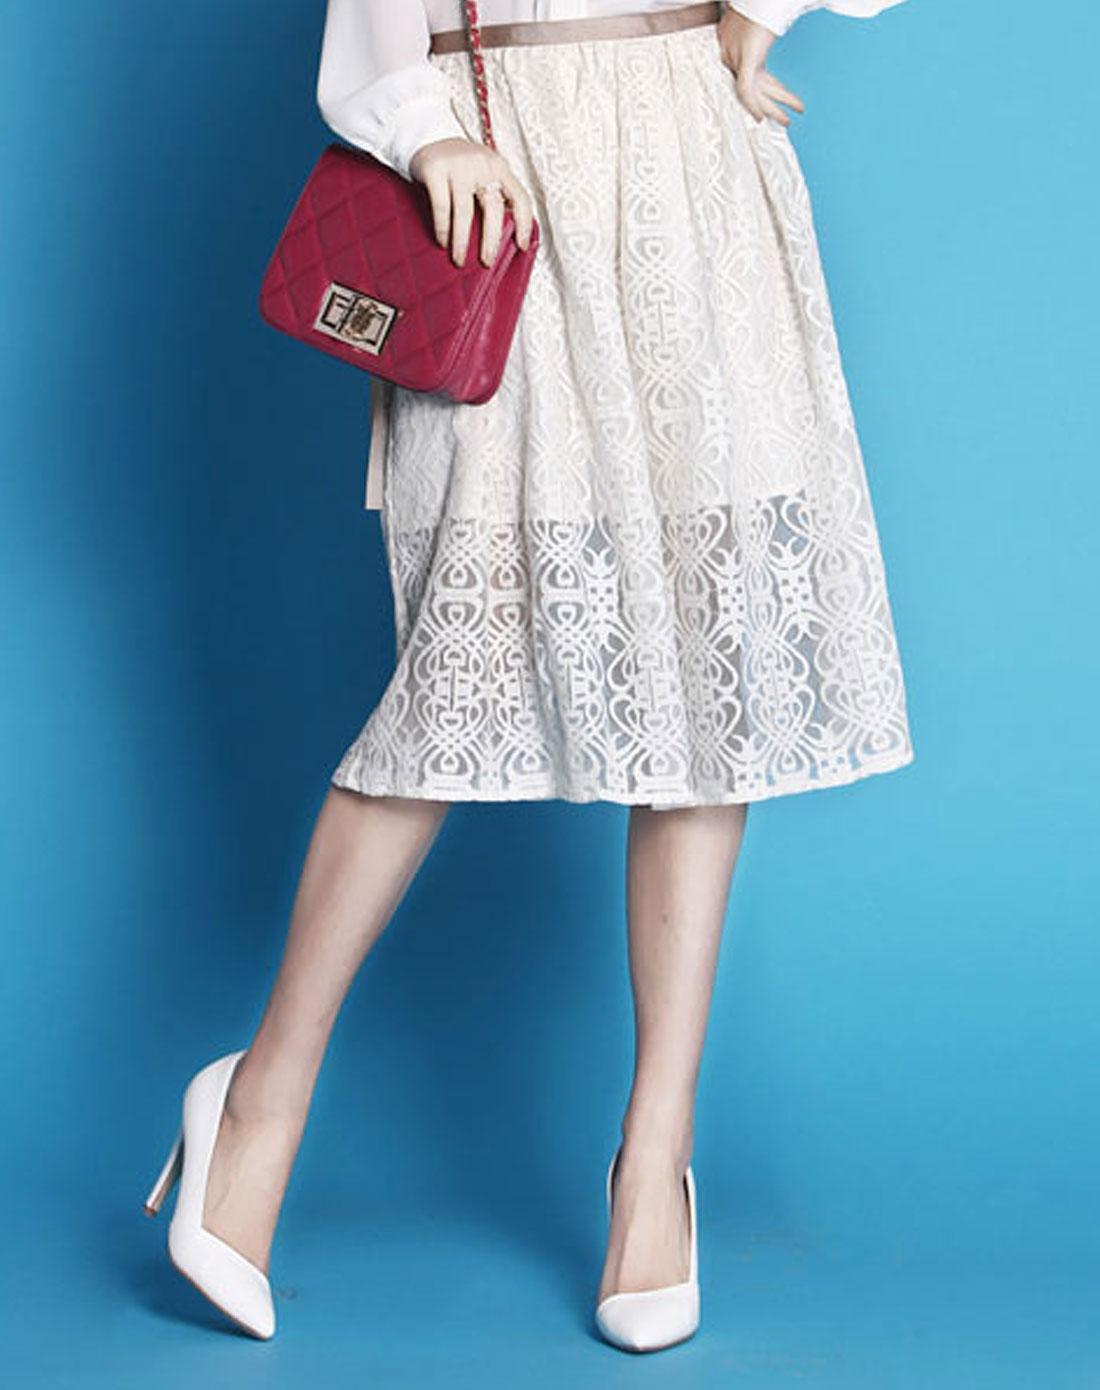 ohdear白色新款白色蕾丝飘带中长款半裙h060001